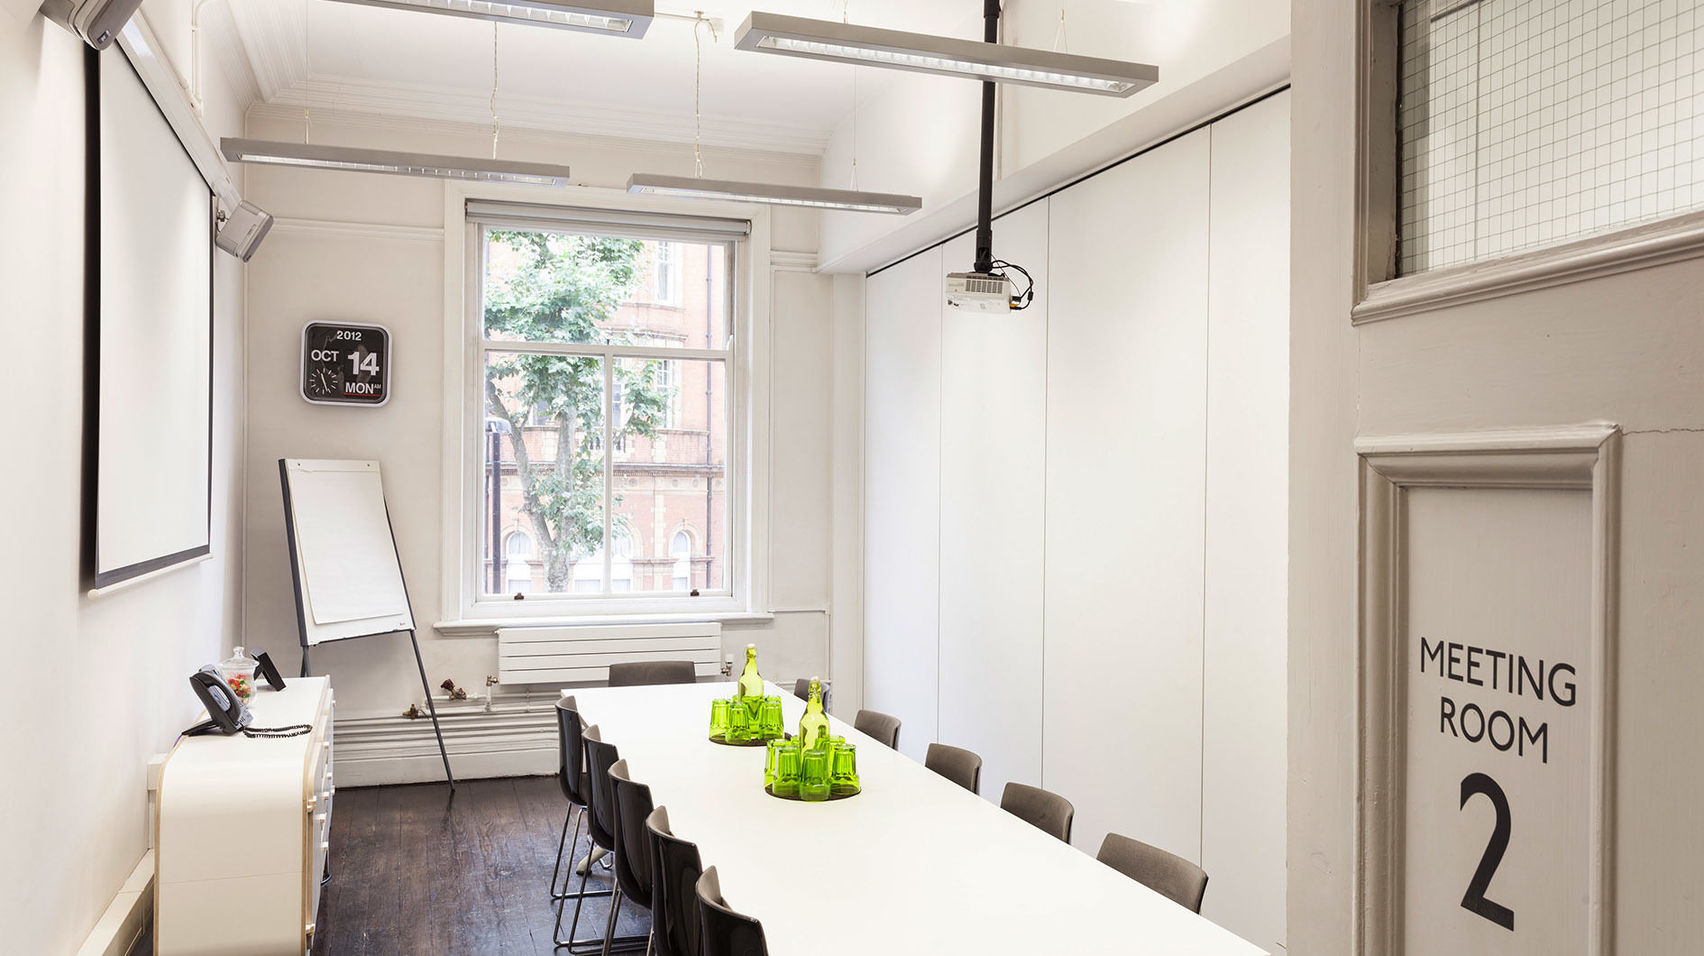 Meeting Room 2, TOG, Marylebone Station